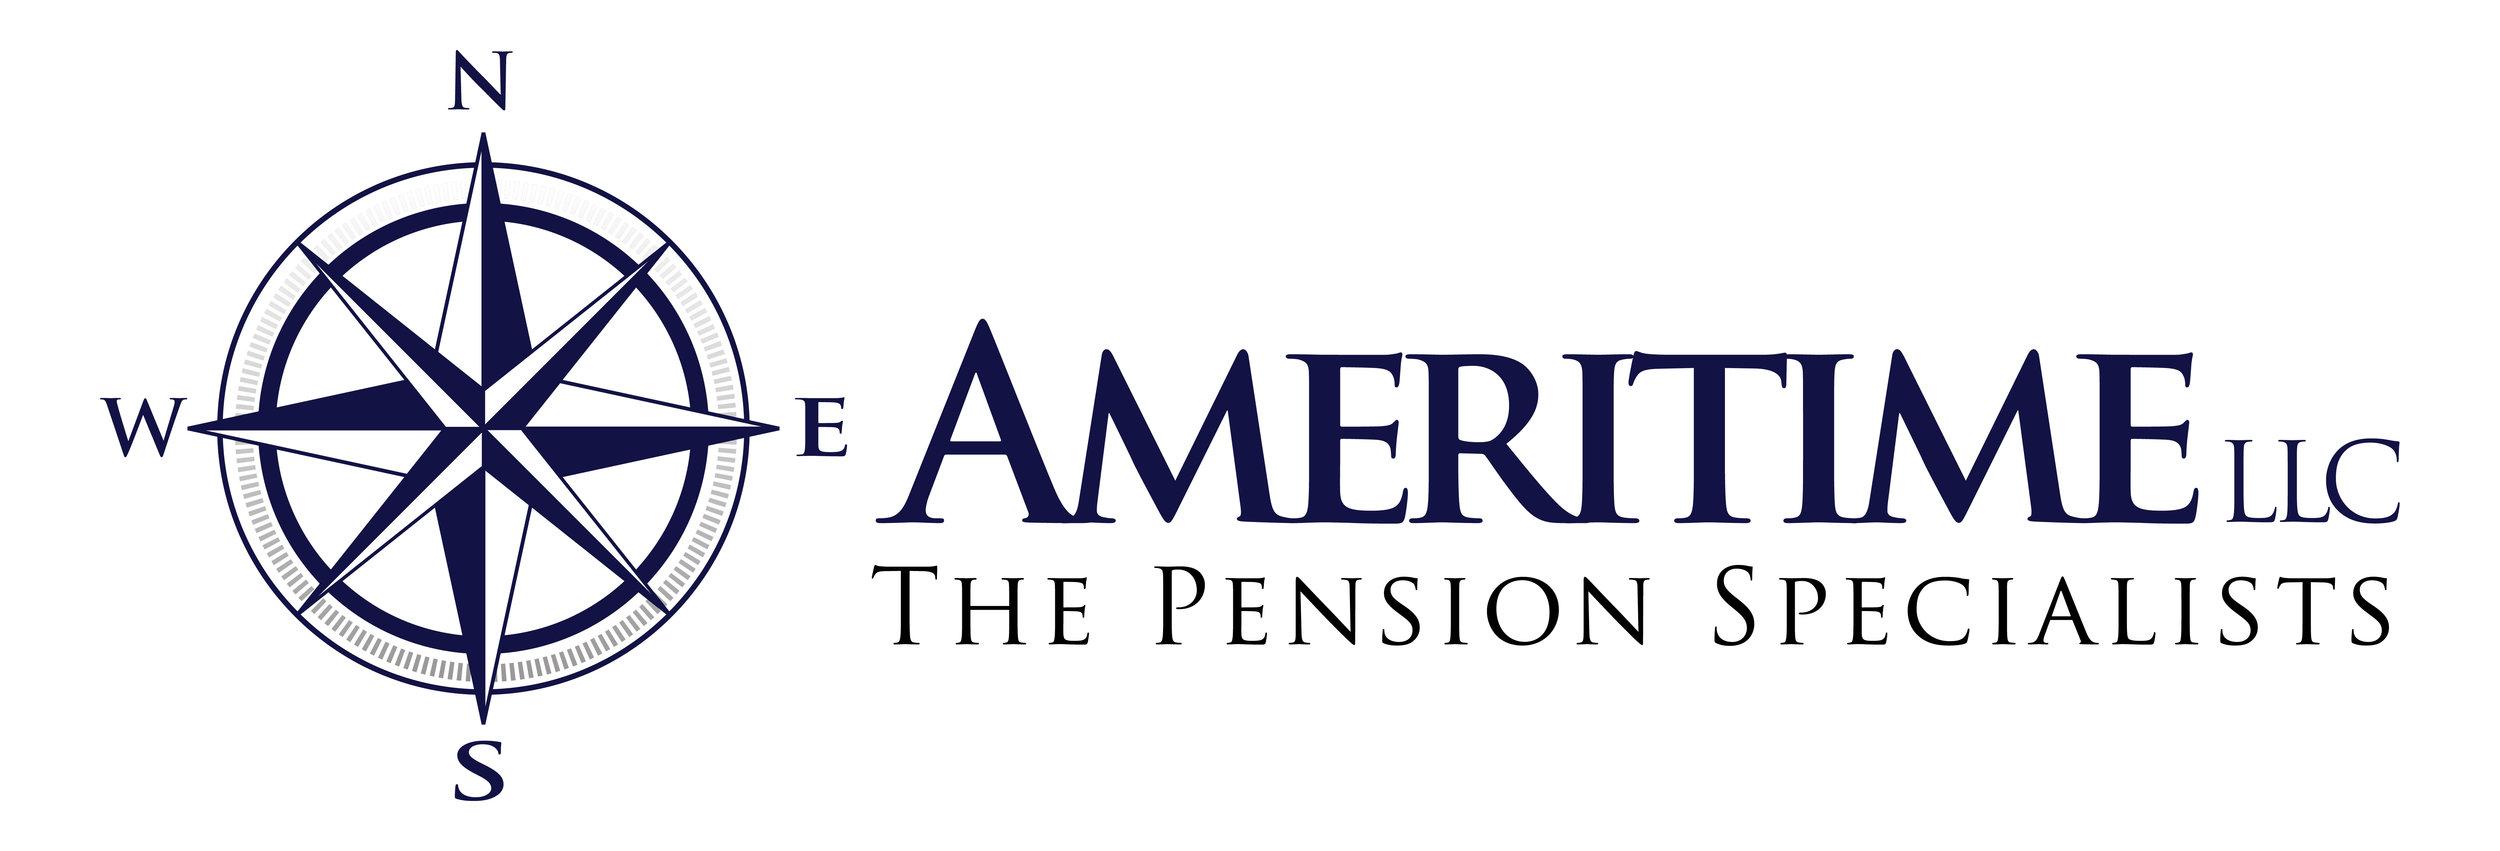 Ameritime Logo - Web.jpg